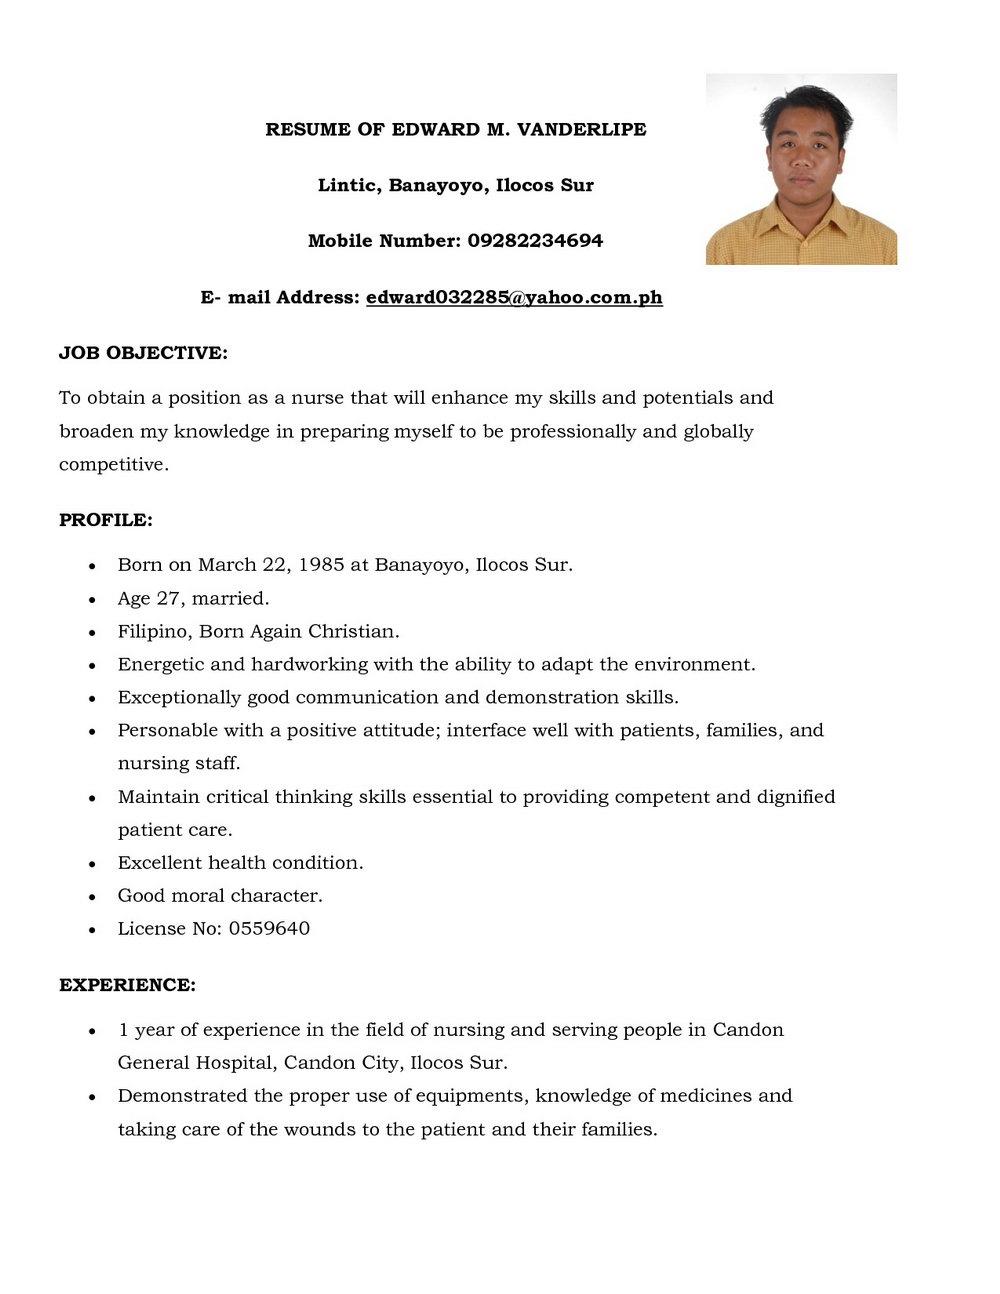 Resume Format For Nurses In Kerala